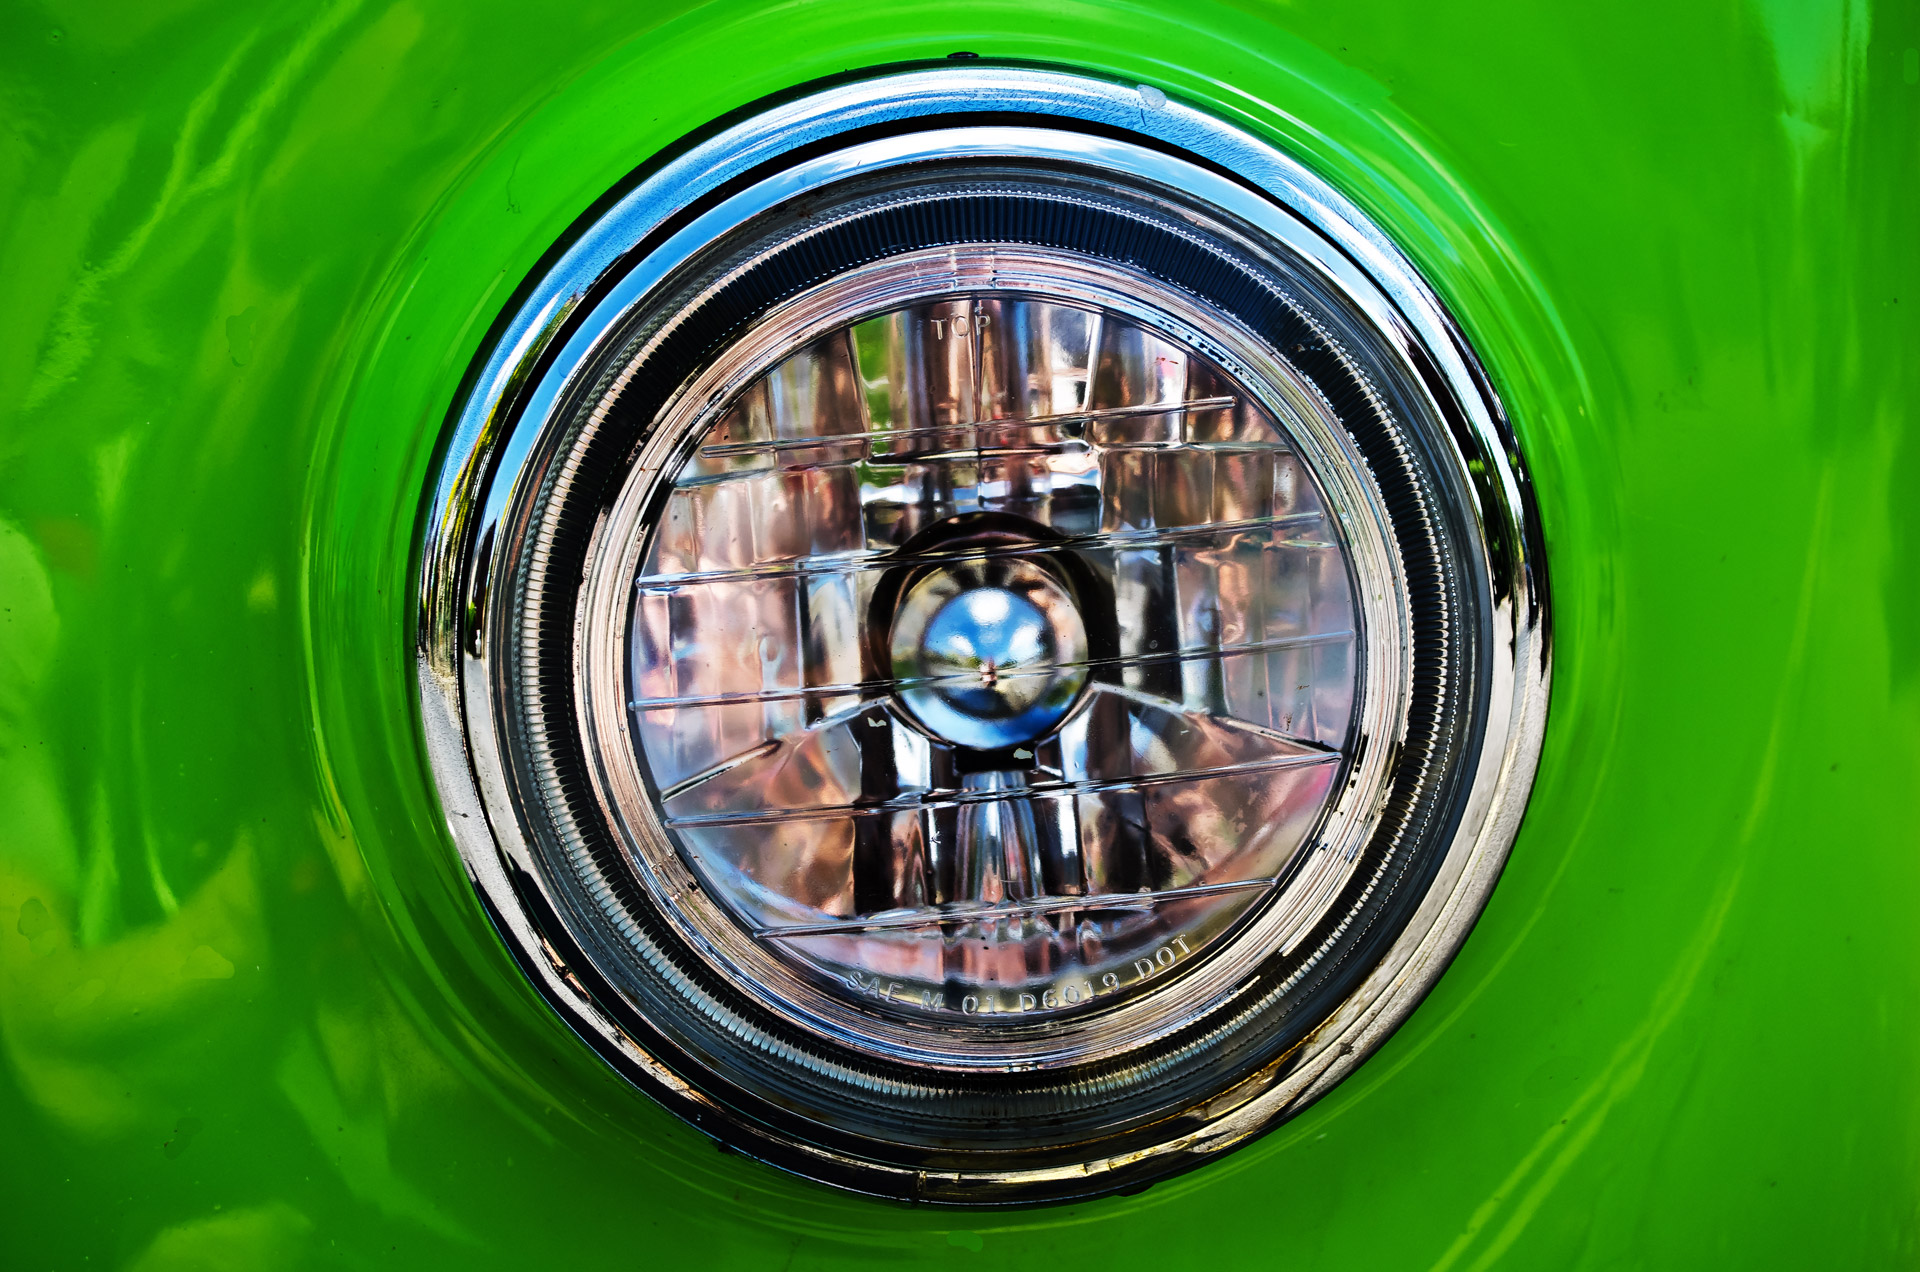 headlight-from-the-car-1338461521TcO